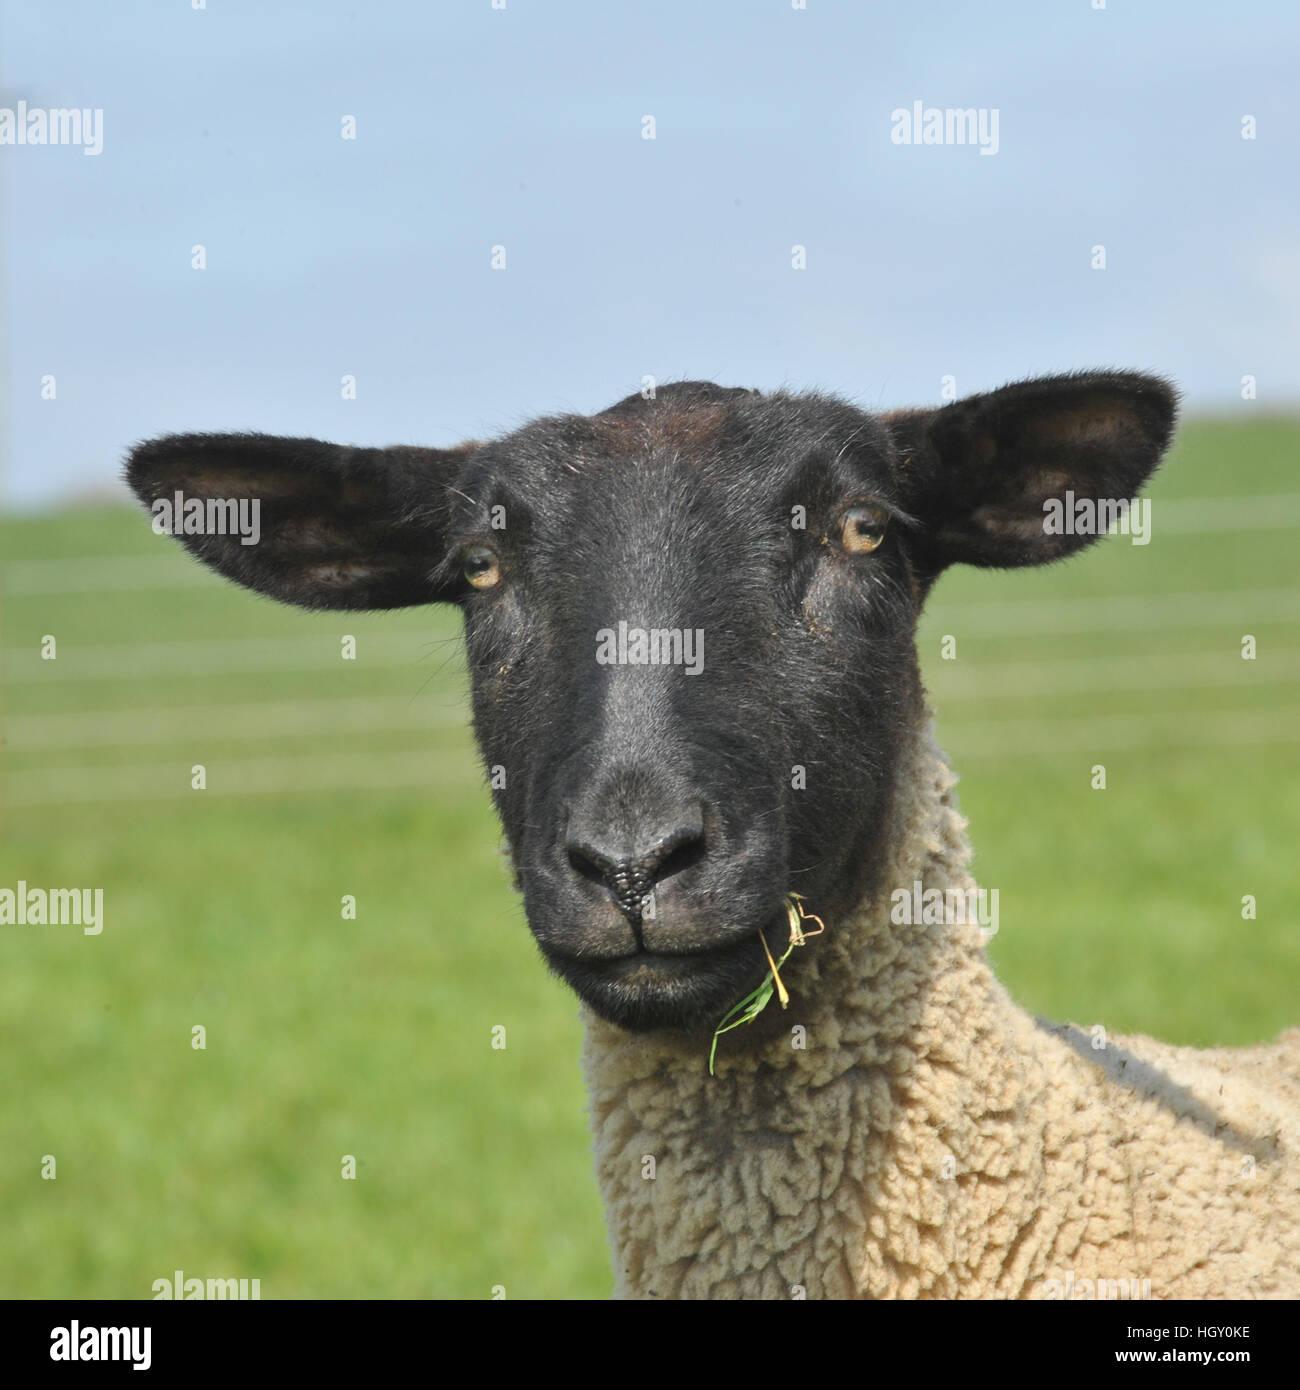 suffolk sheep - Stock Image